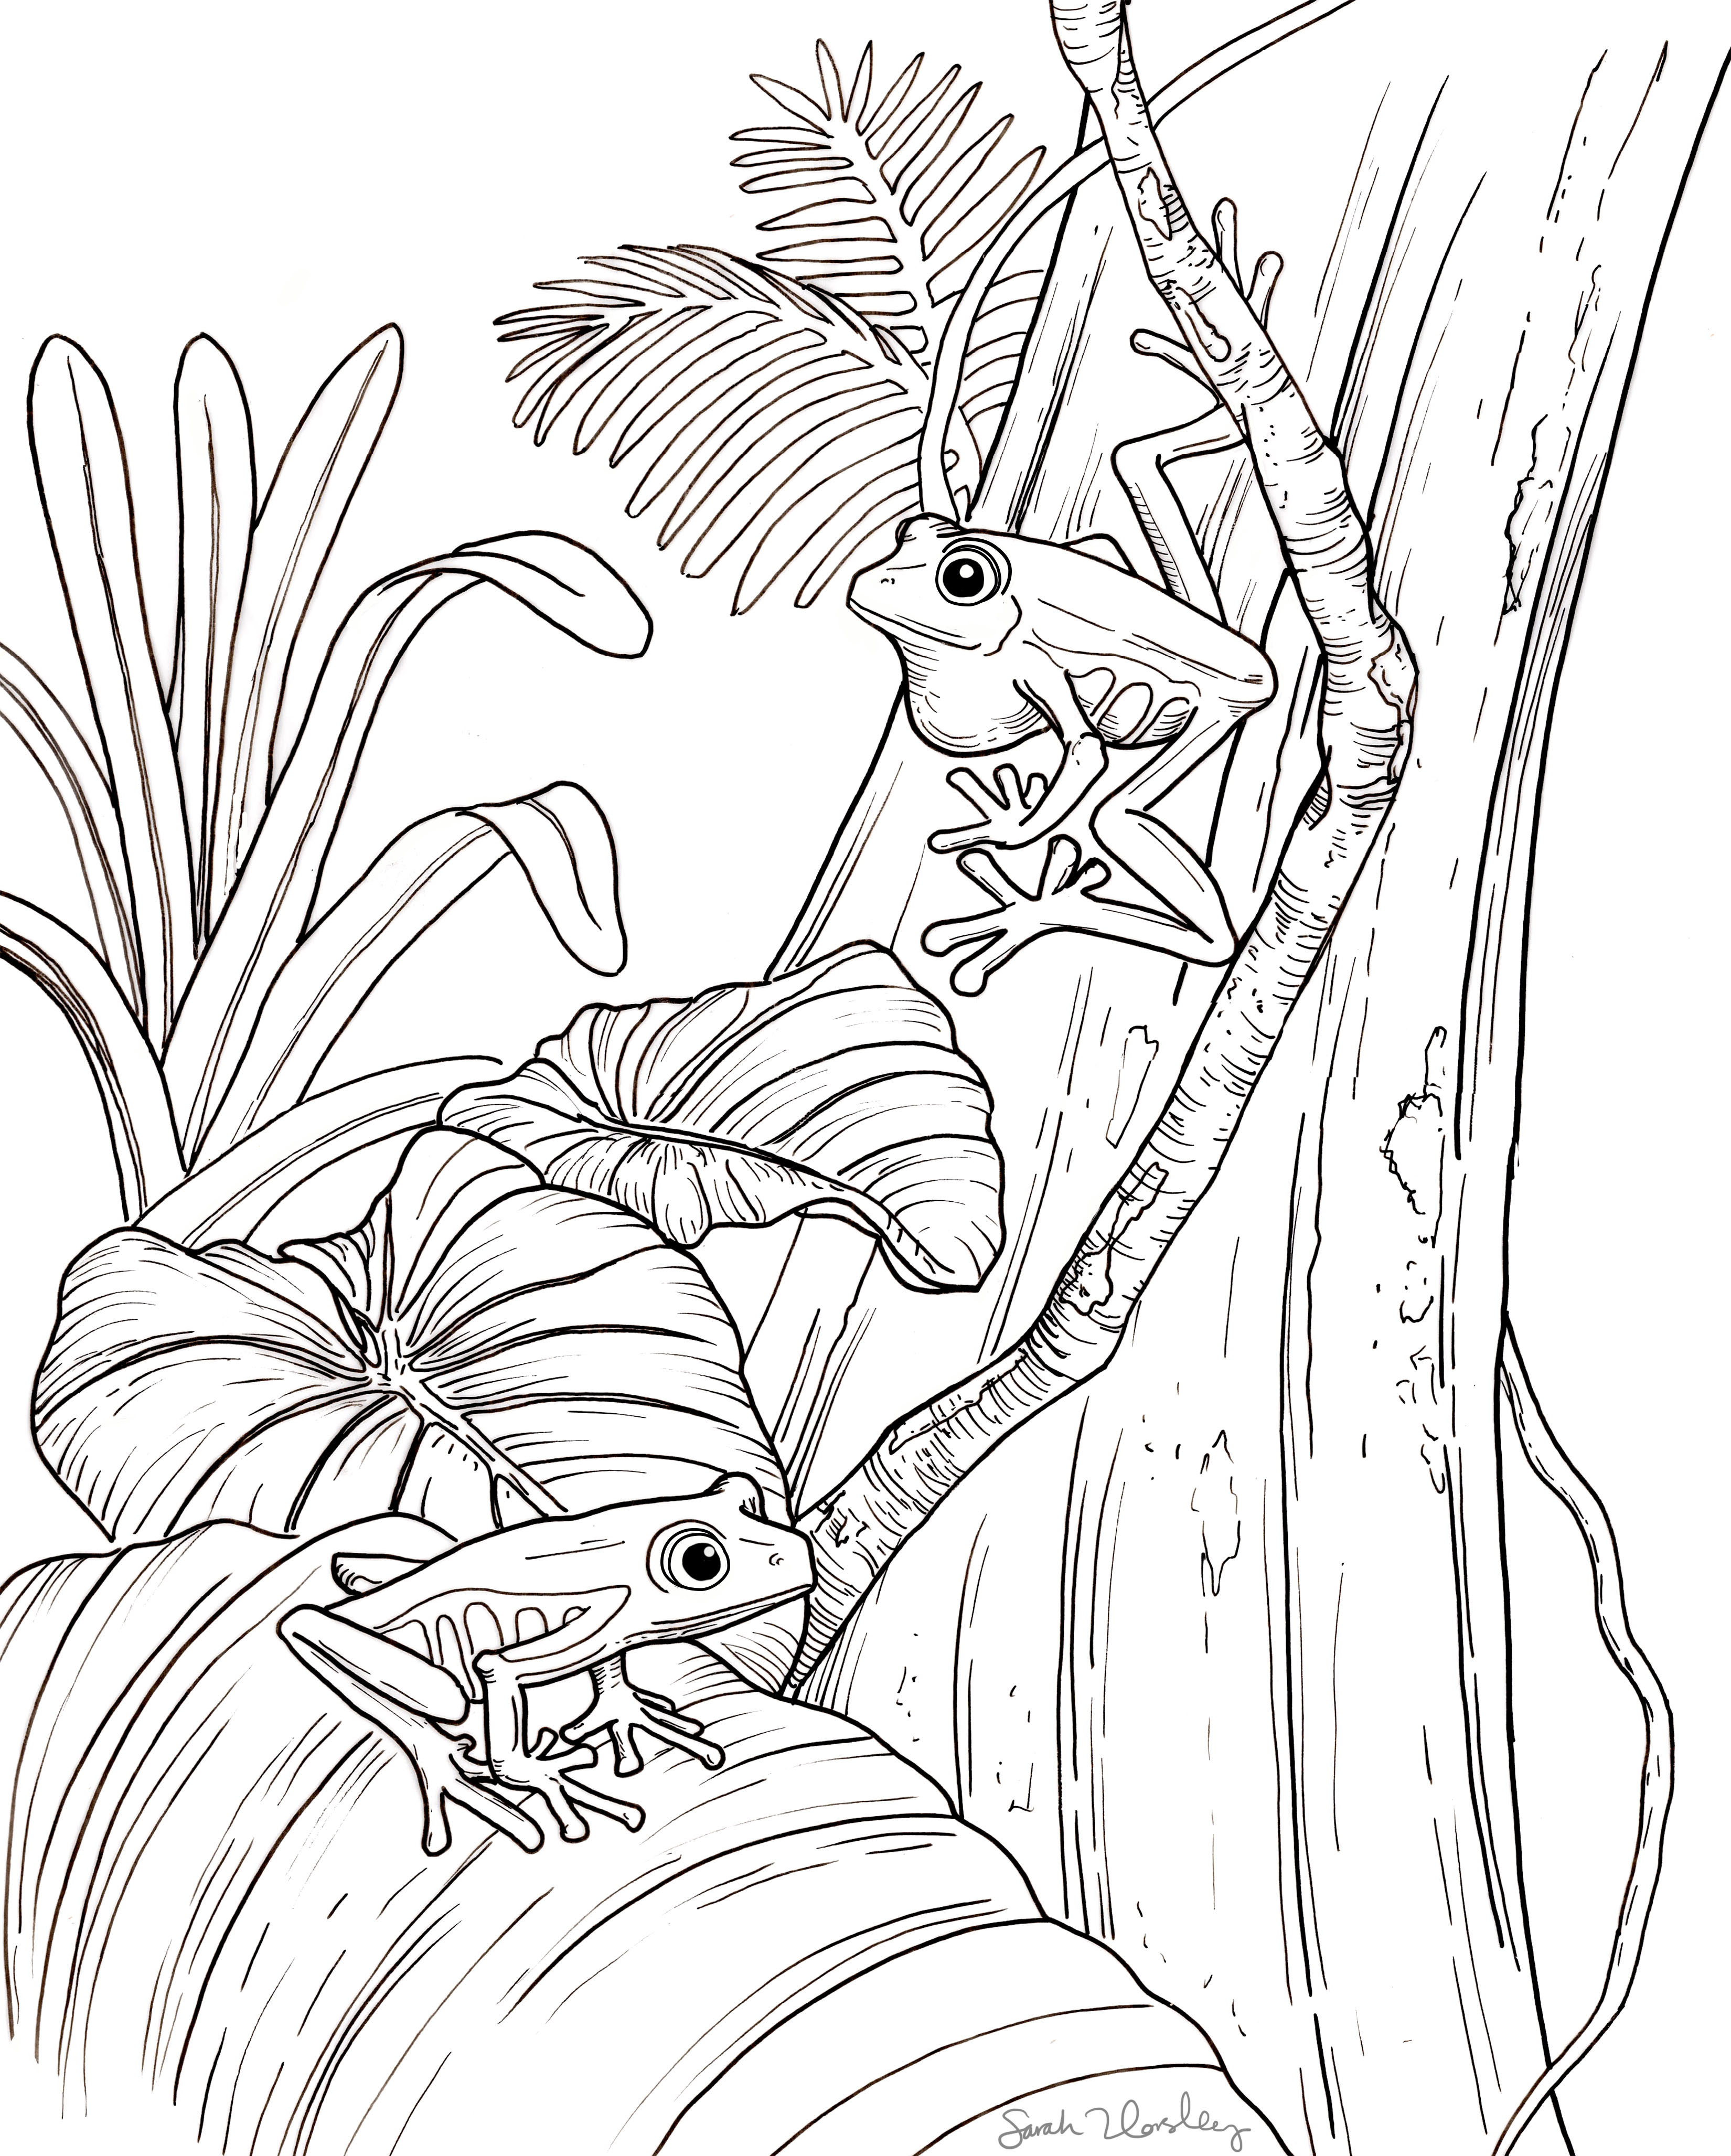 Amphibian Coloring Book Pages Sarah Horsley